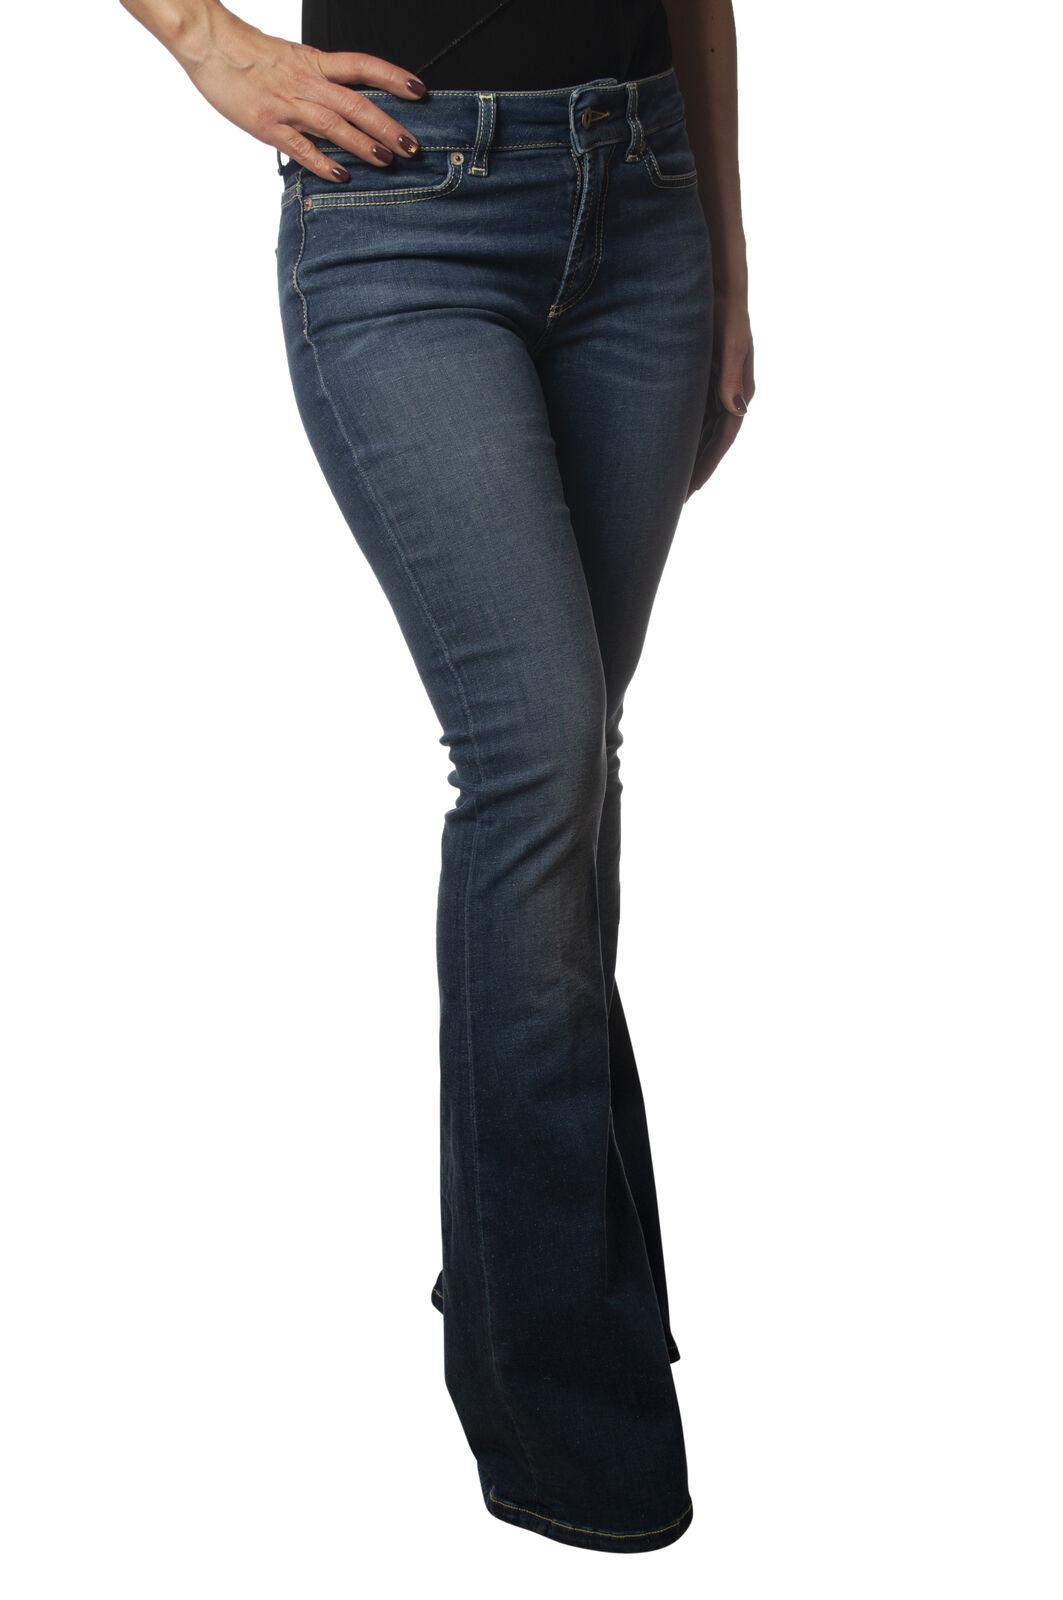 Dondup -  Jeans-Hose, slim fit - Frau - Denim - 5938609E191242  ahorra hasta un 50%